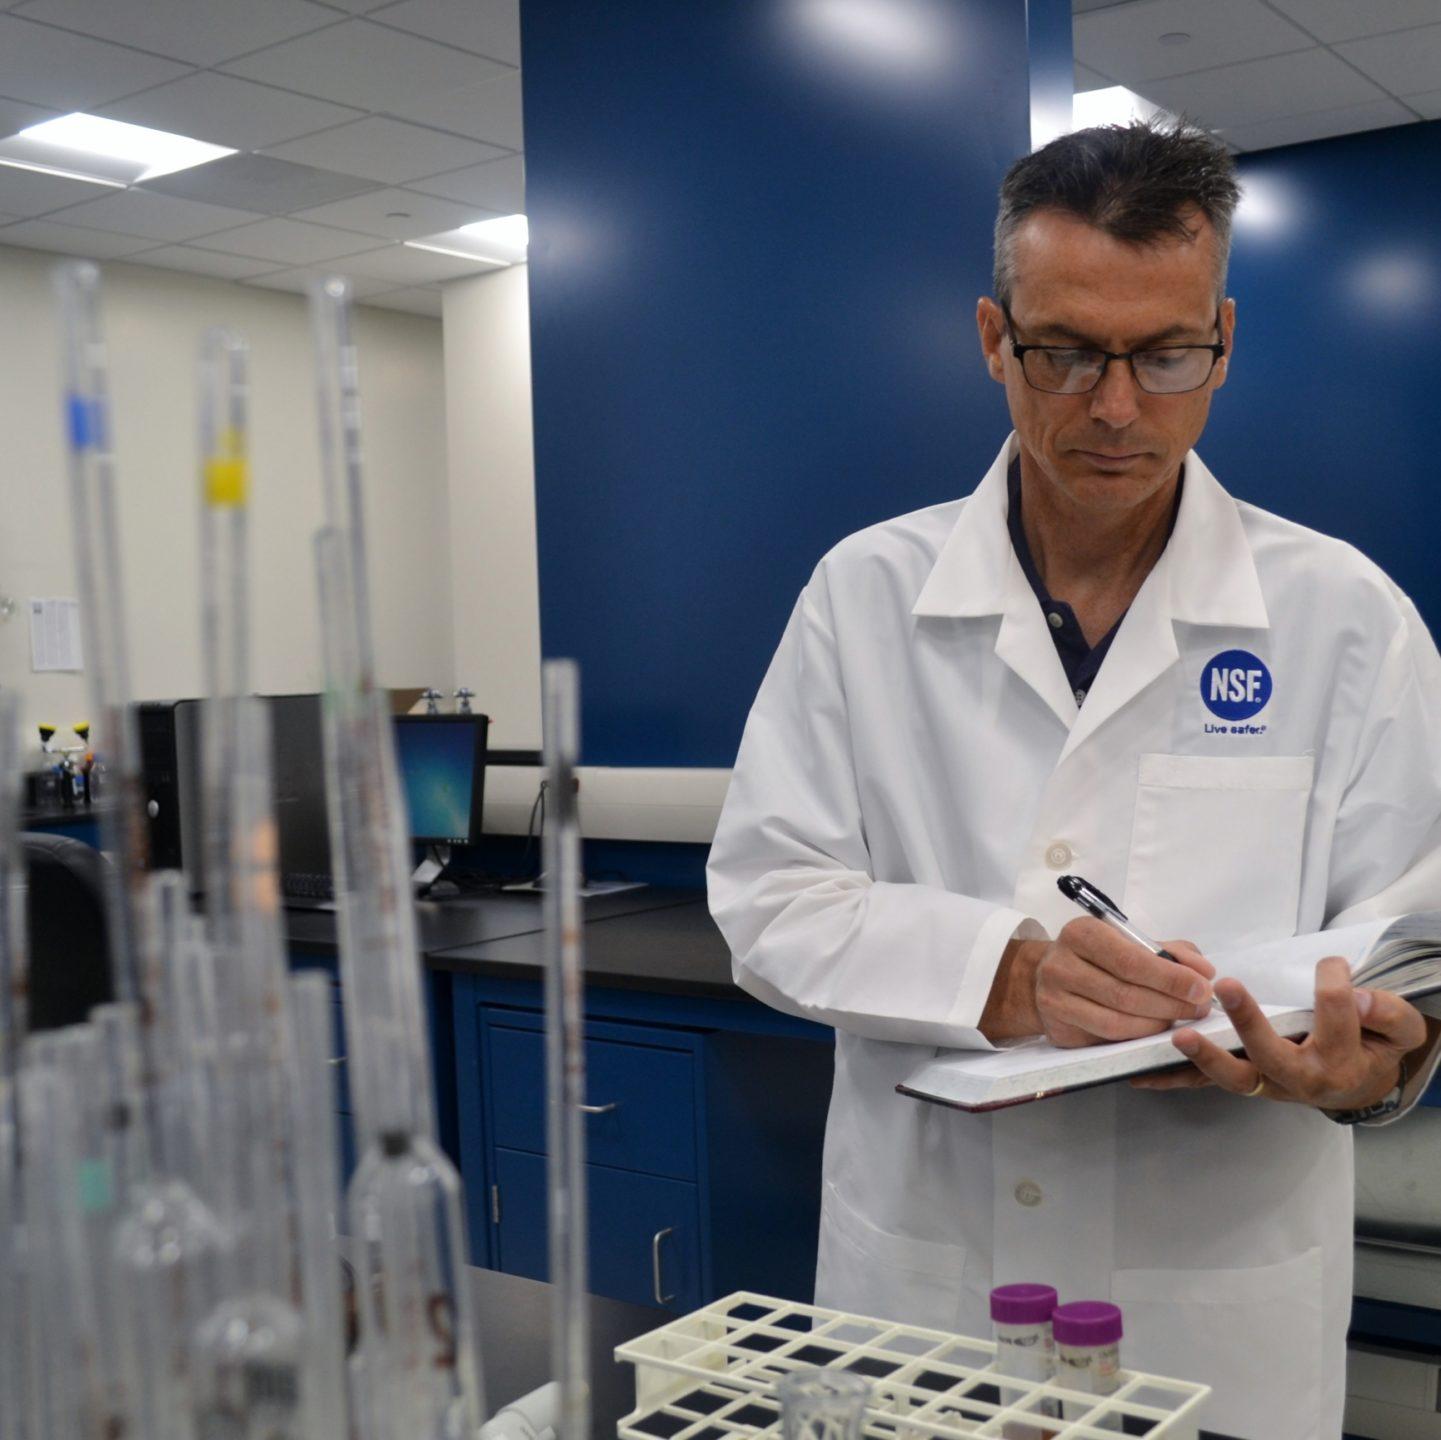 John Travis on notebook in lab